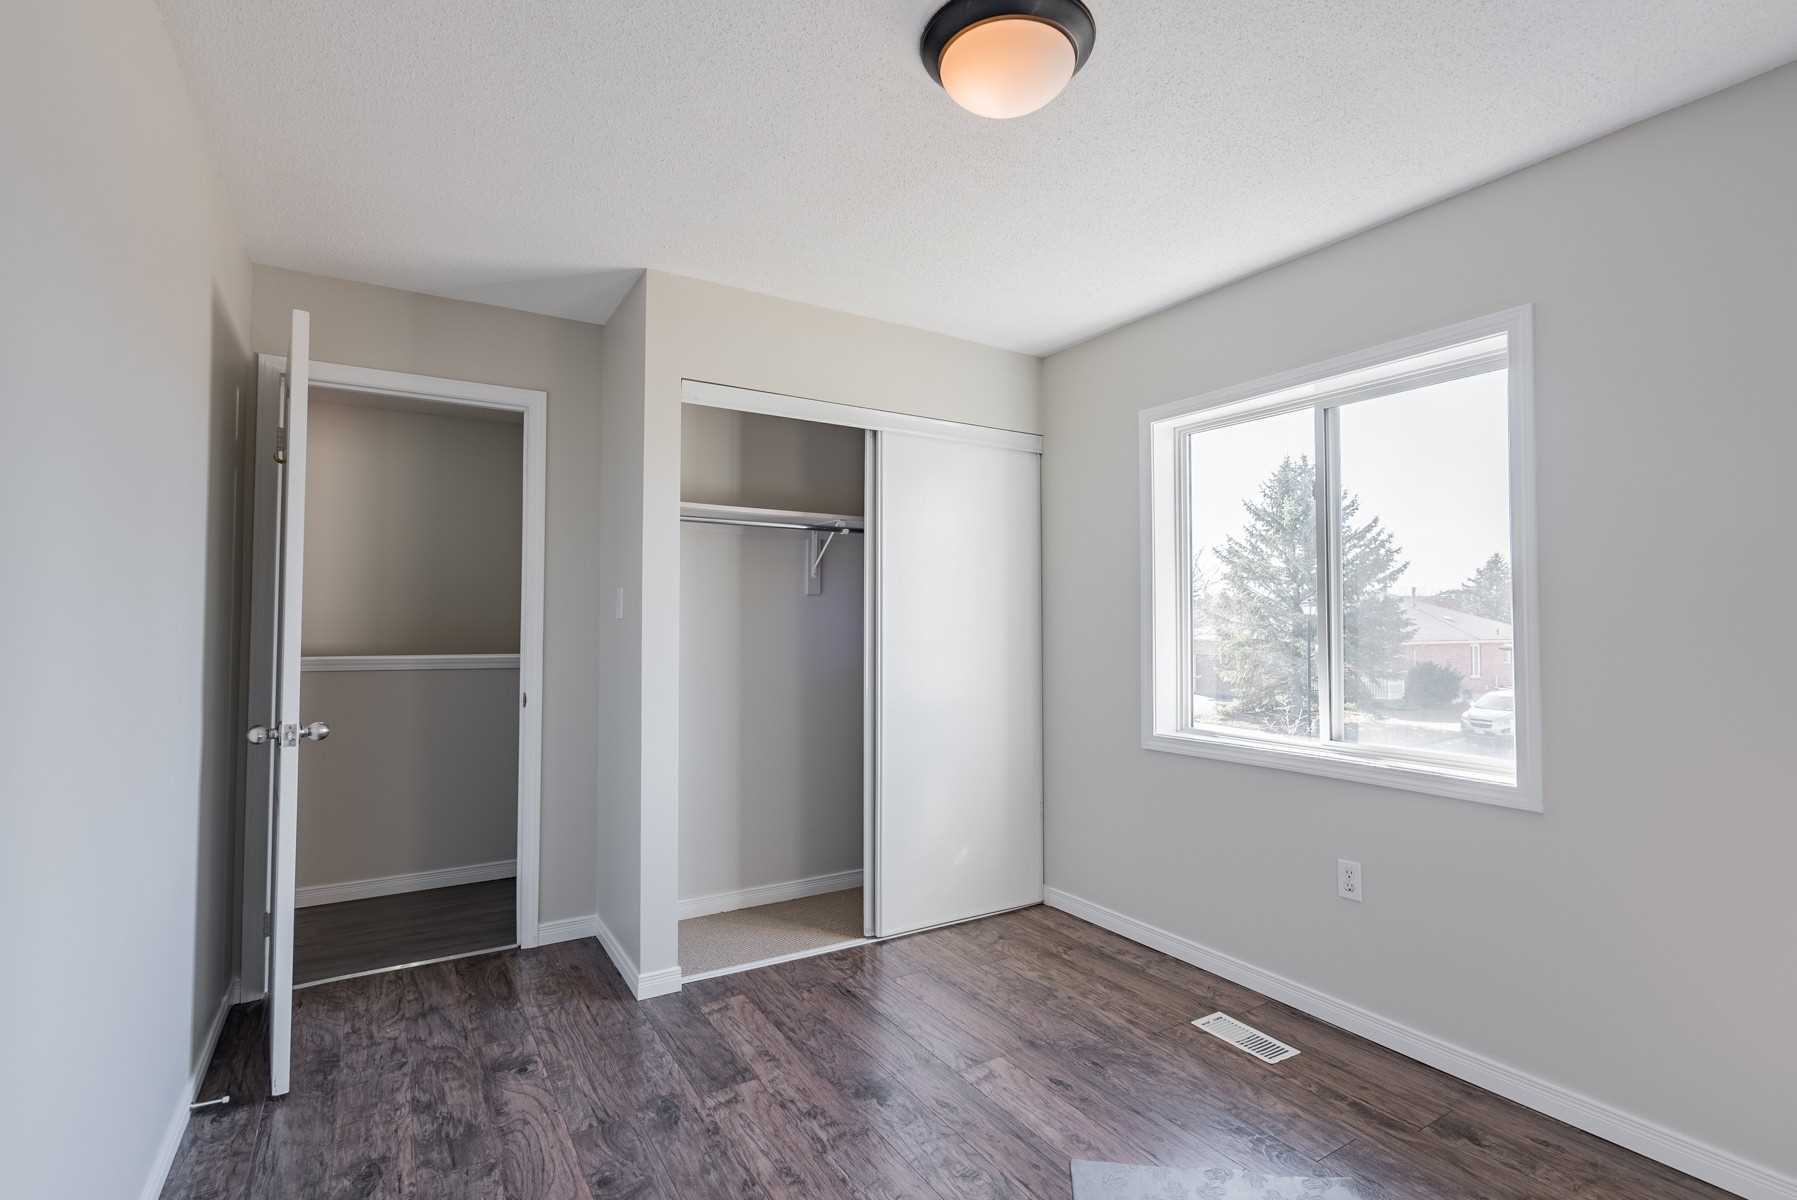 33-1 Testa Rd, Uxbridge, Ontario L9P1Y9, 2 Bedrooms Bedrooms, ,1 BathroomBathrooms,Condo Townhouse,For Sale,Testa,N5167947